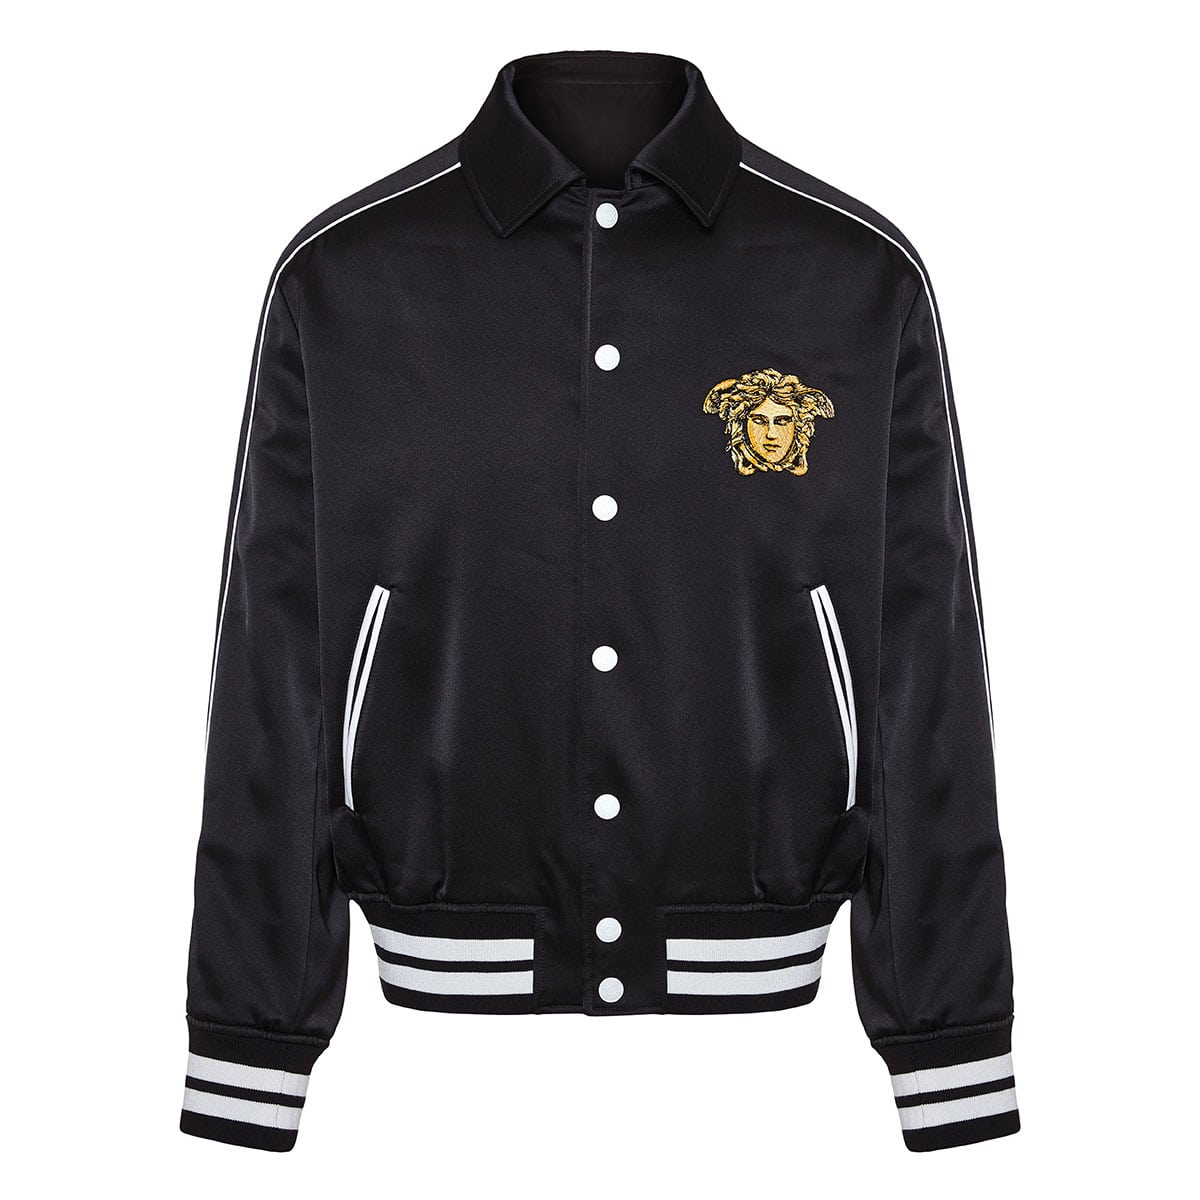 Dragon-embroidered satin bomber jacket